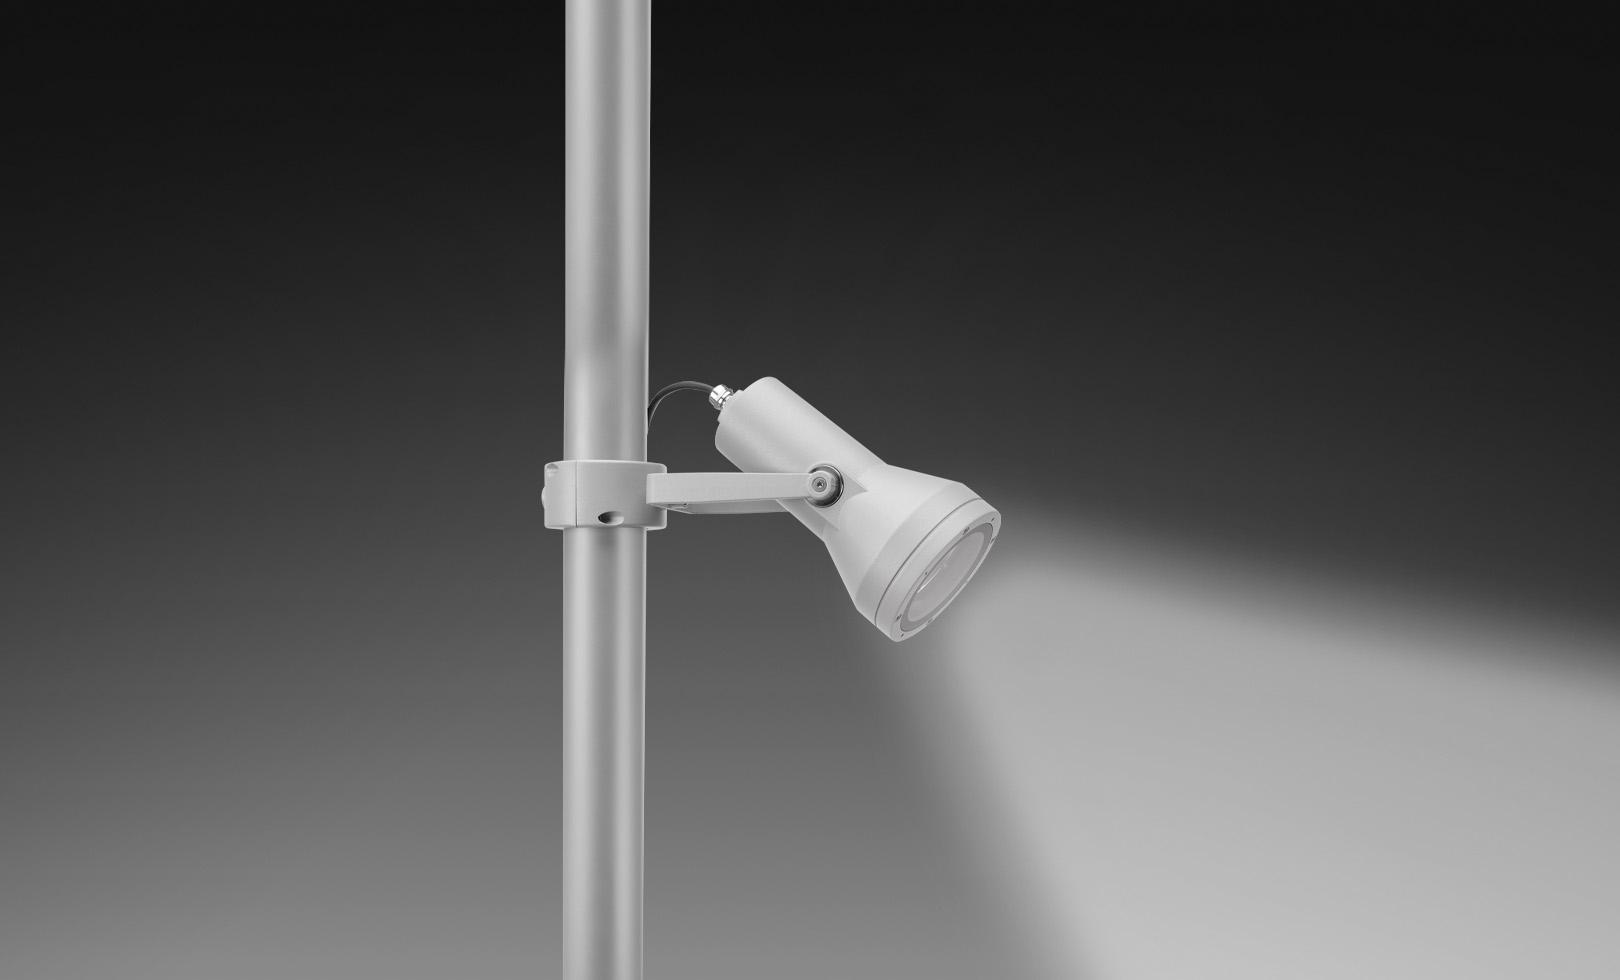 805001-805005 FLASH POLE MEDIUM LED 8W 1